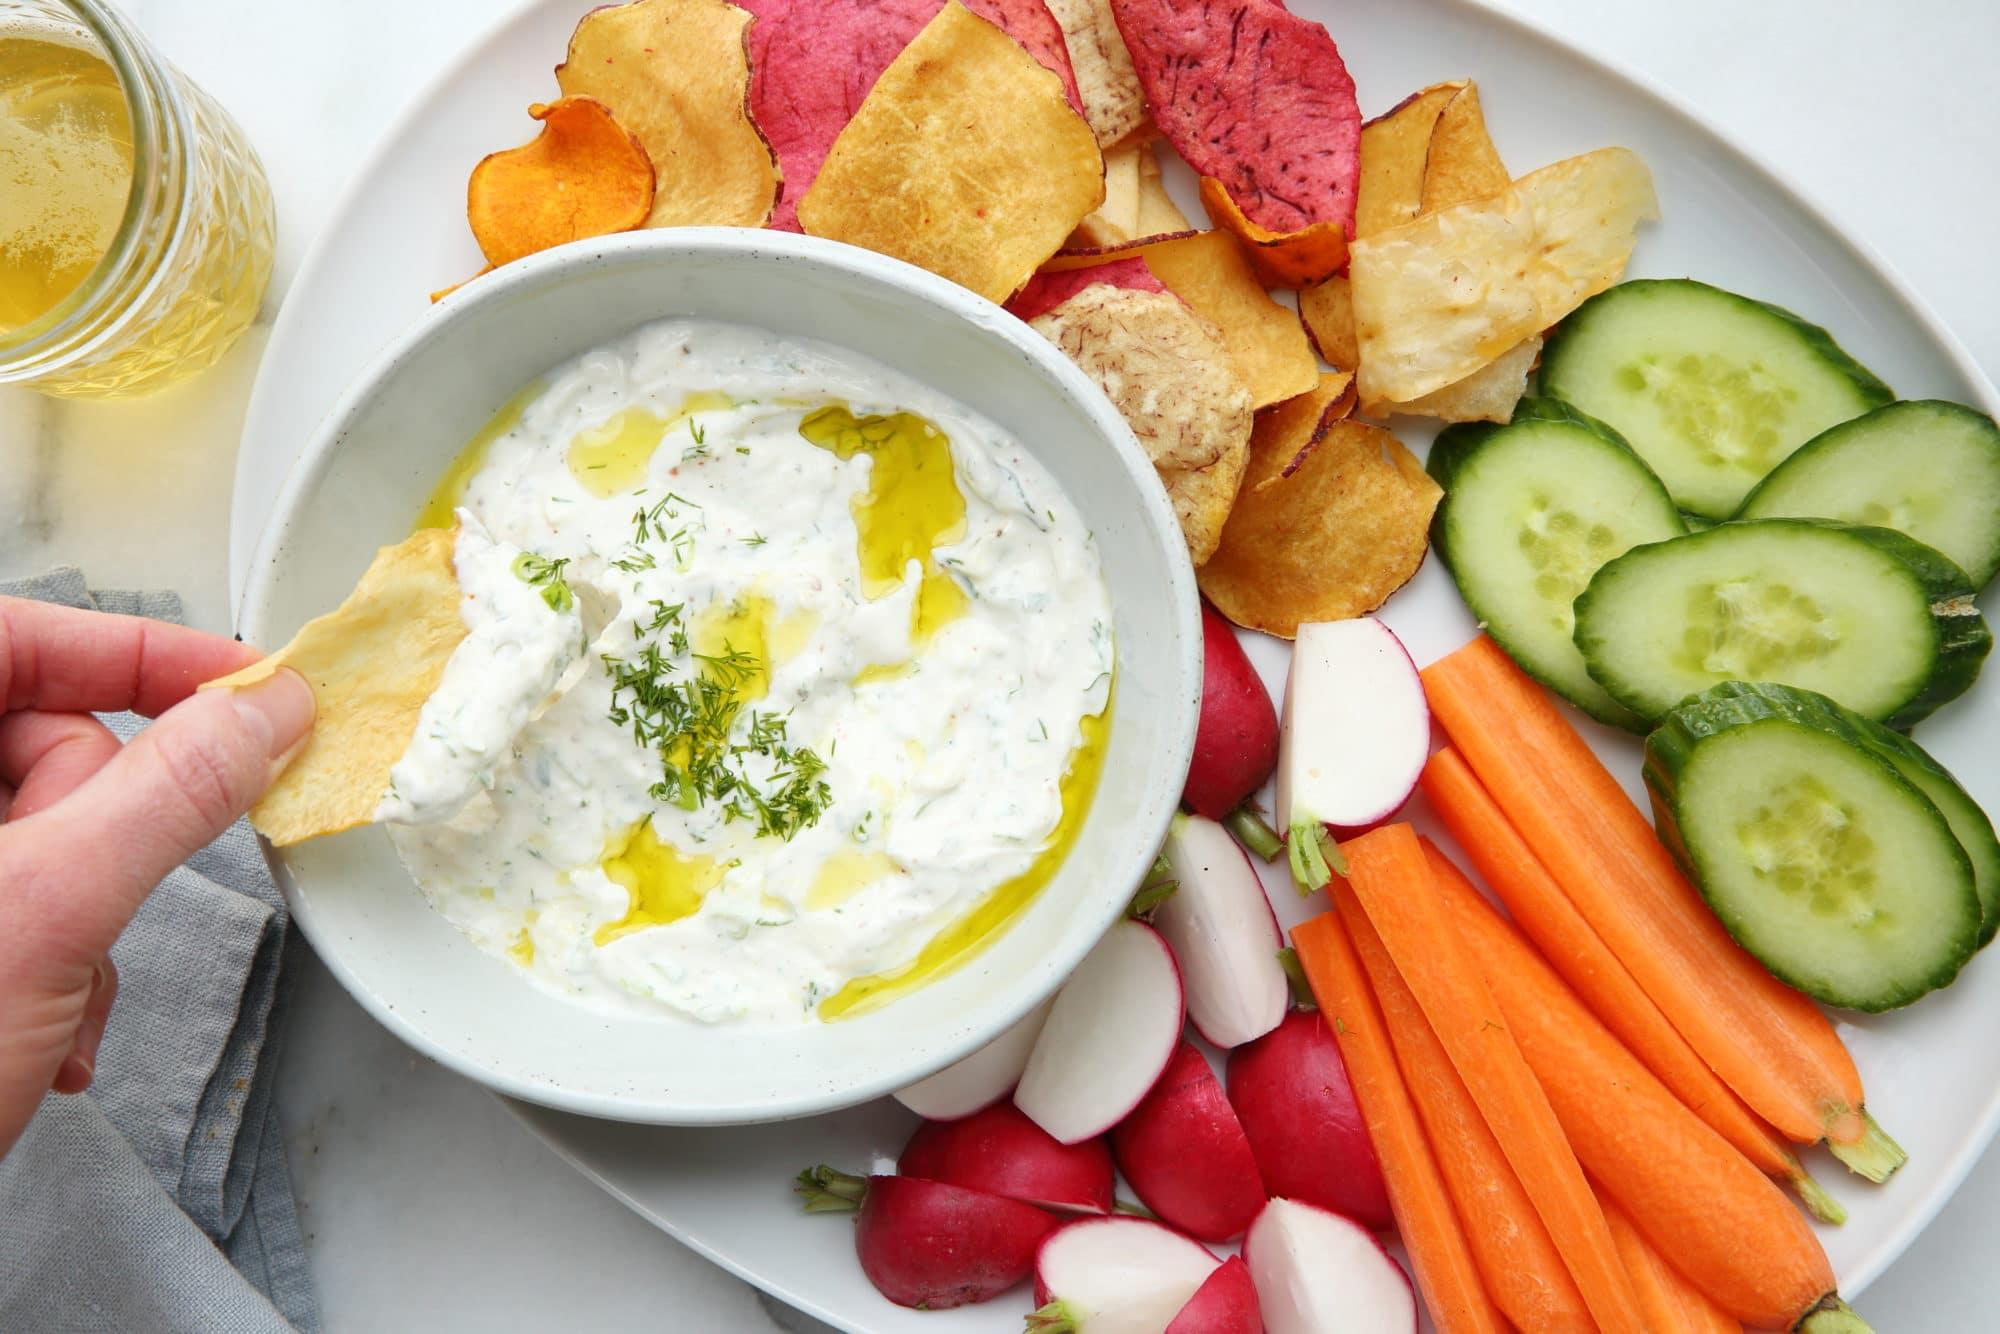 Yogurt feta dip with potato chips and veggies